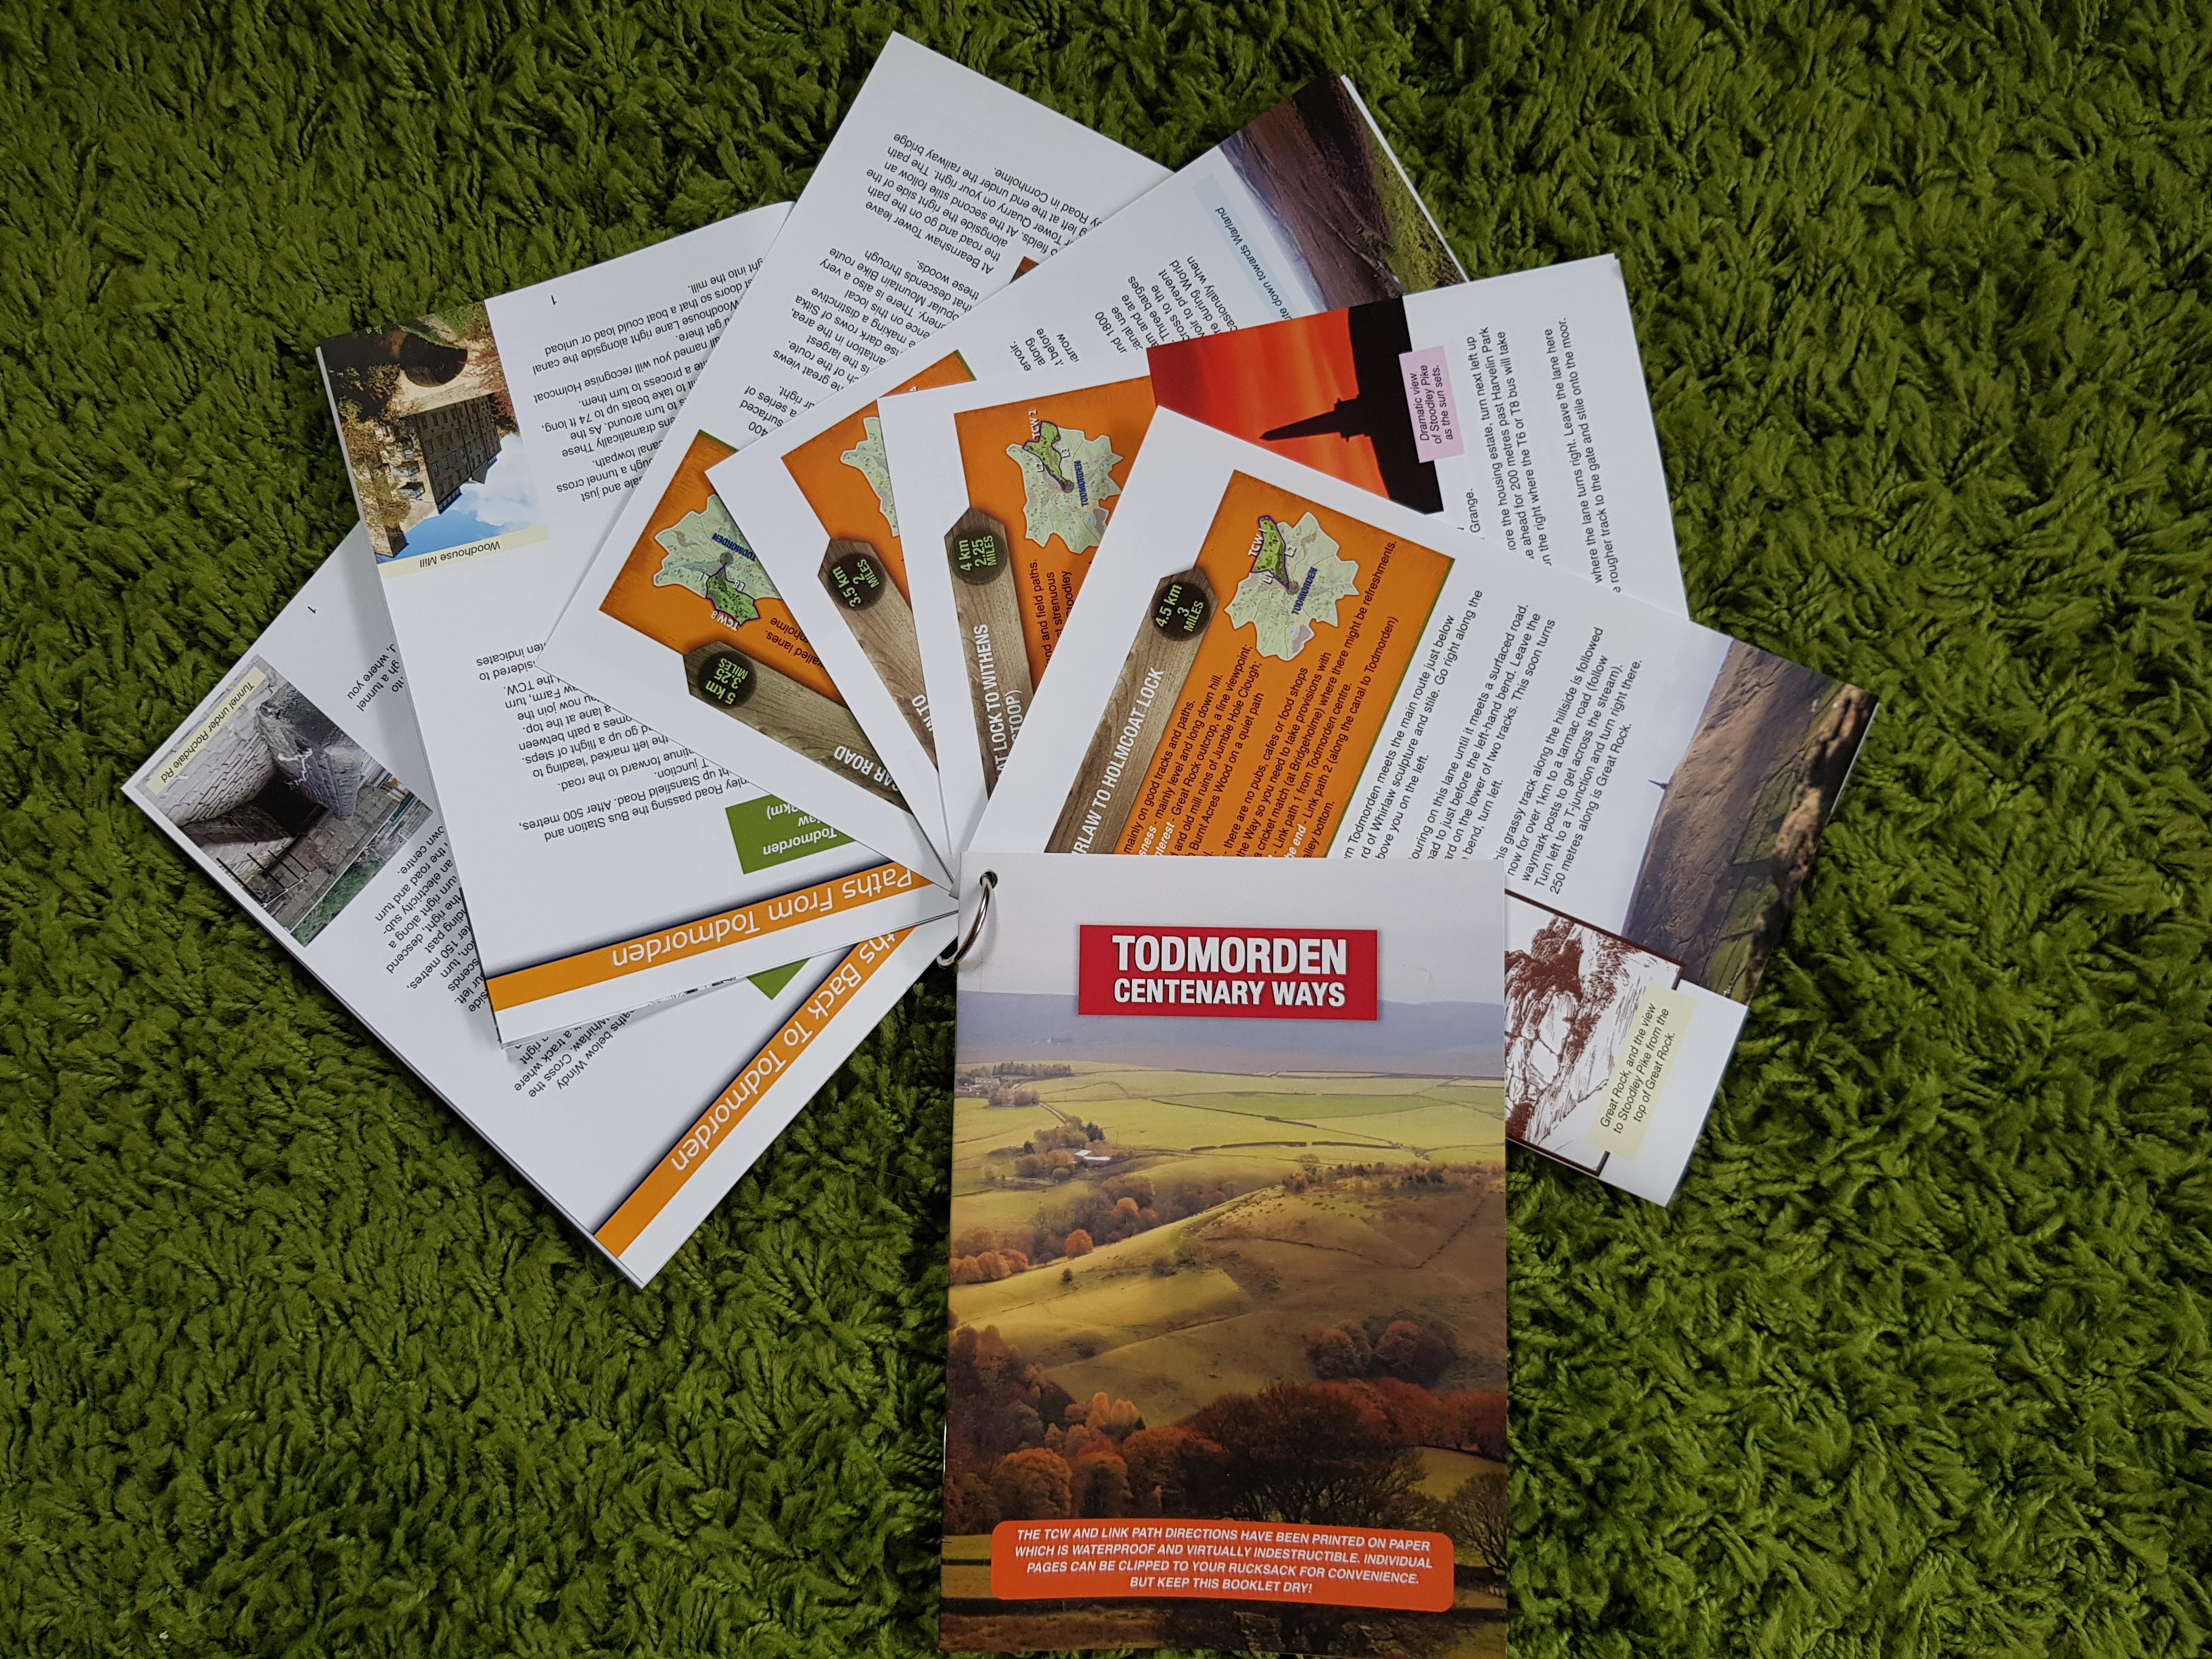 The new Todmorden Centenary Ways Guide.jpg